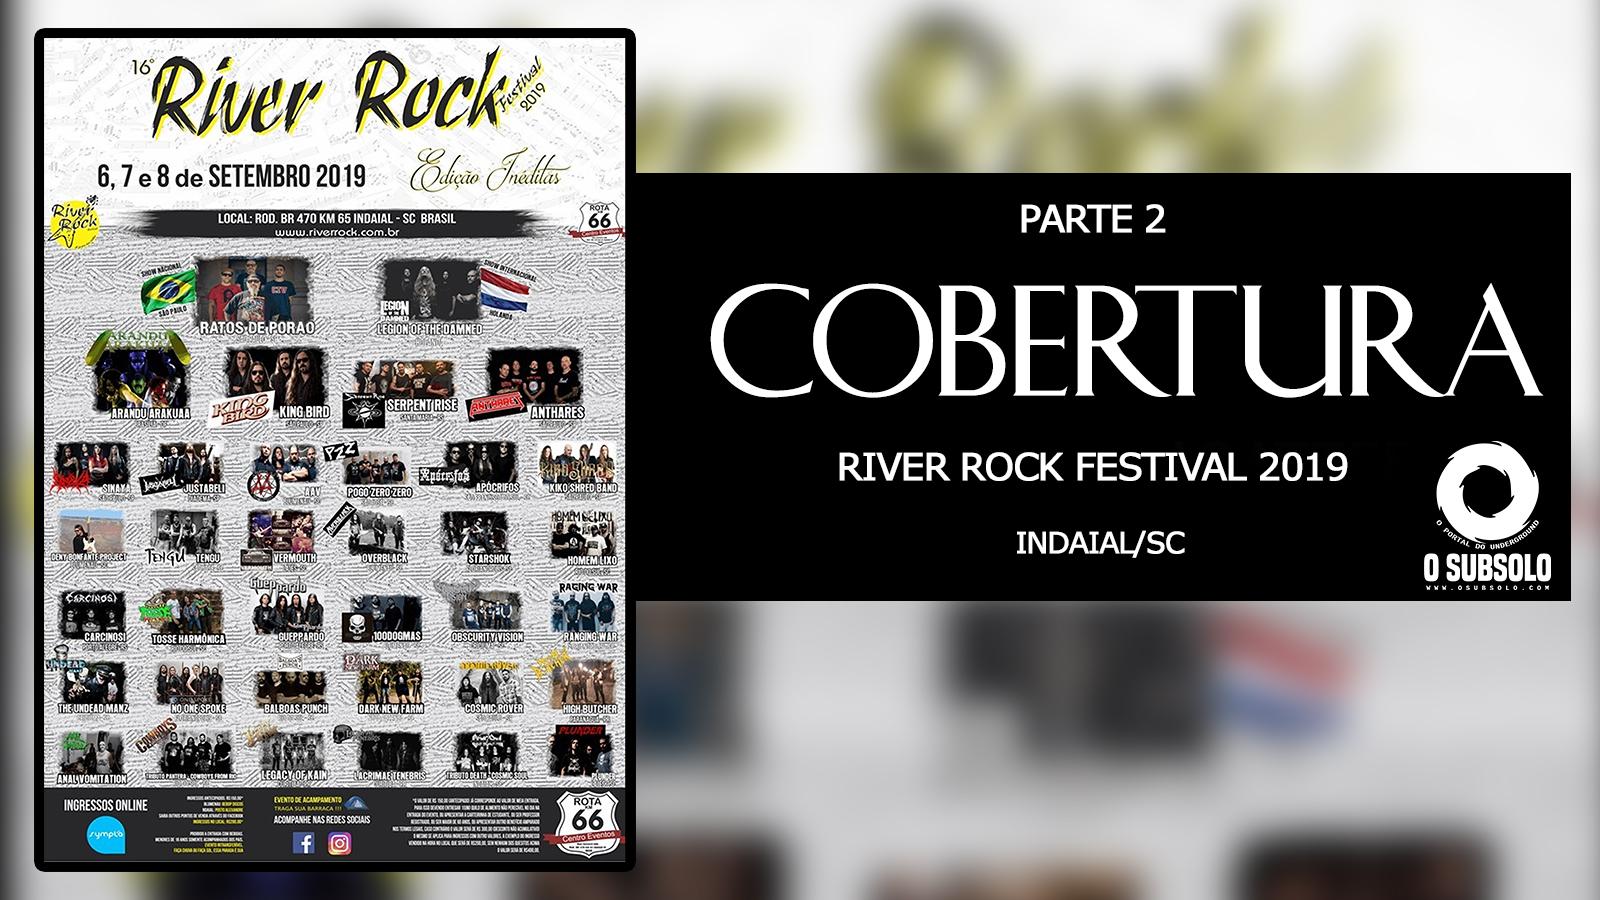 COBERTURA | RIVER ROCK FESTIVAL - INDAIAL-SC | O SUBSOLO